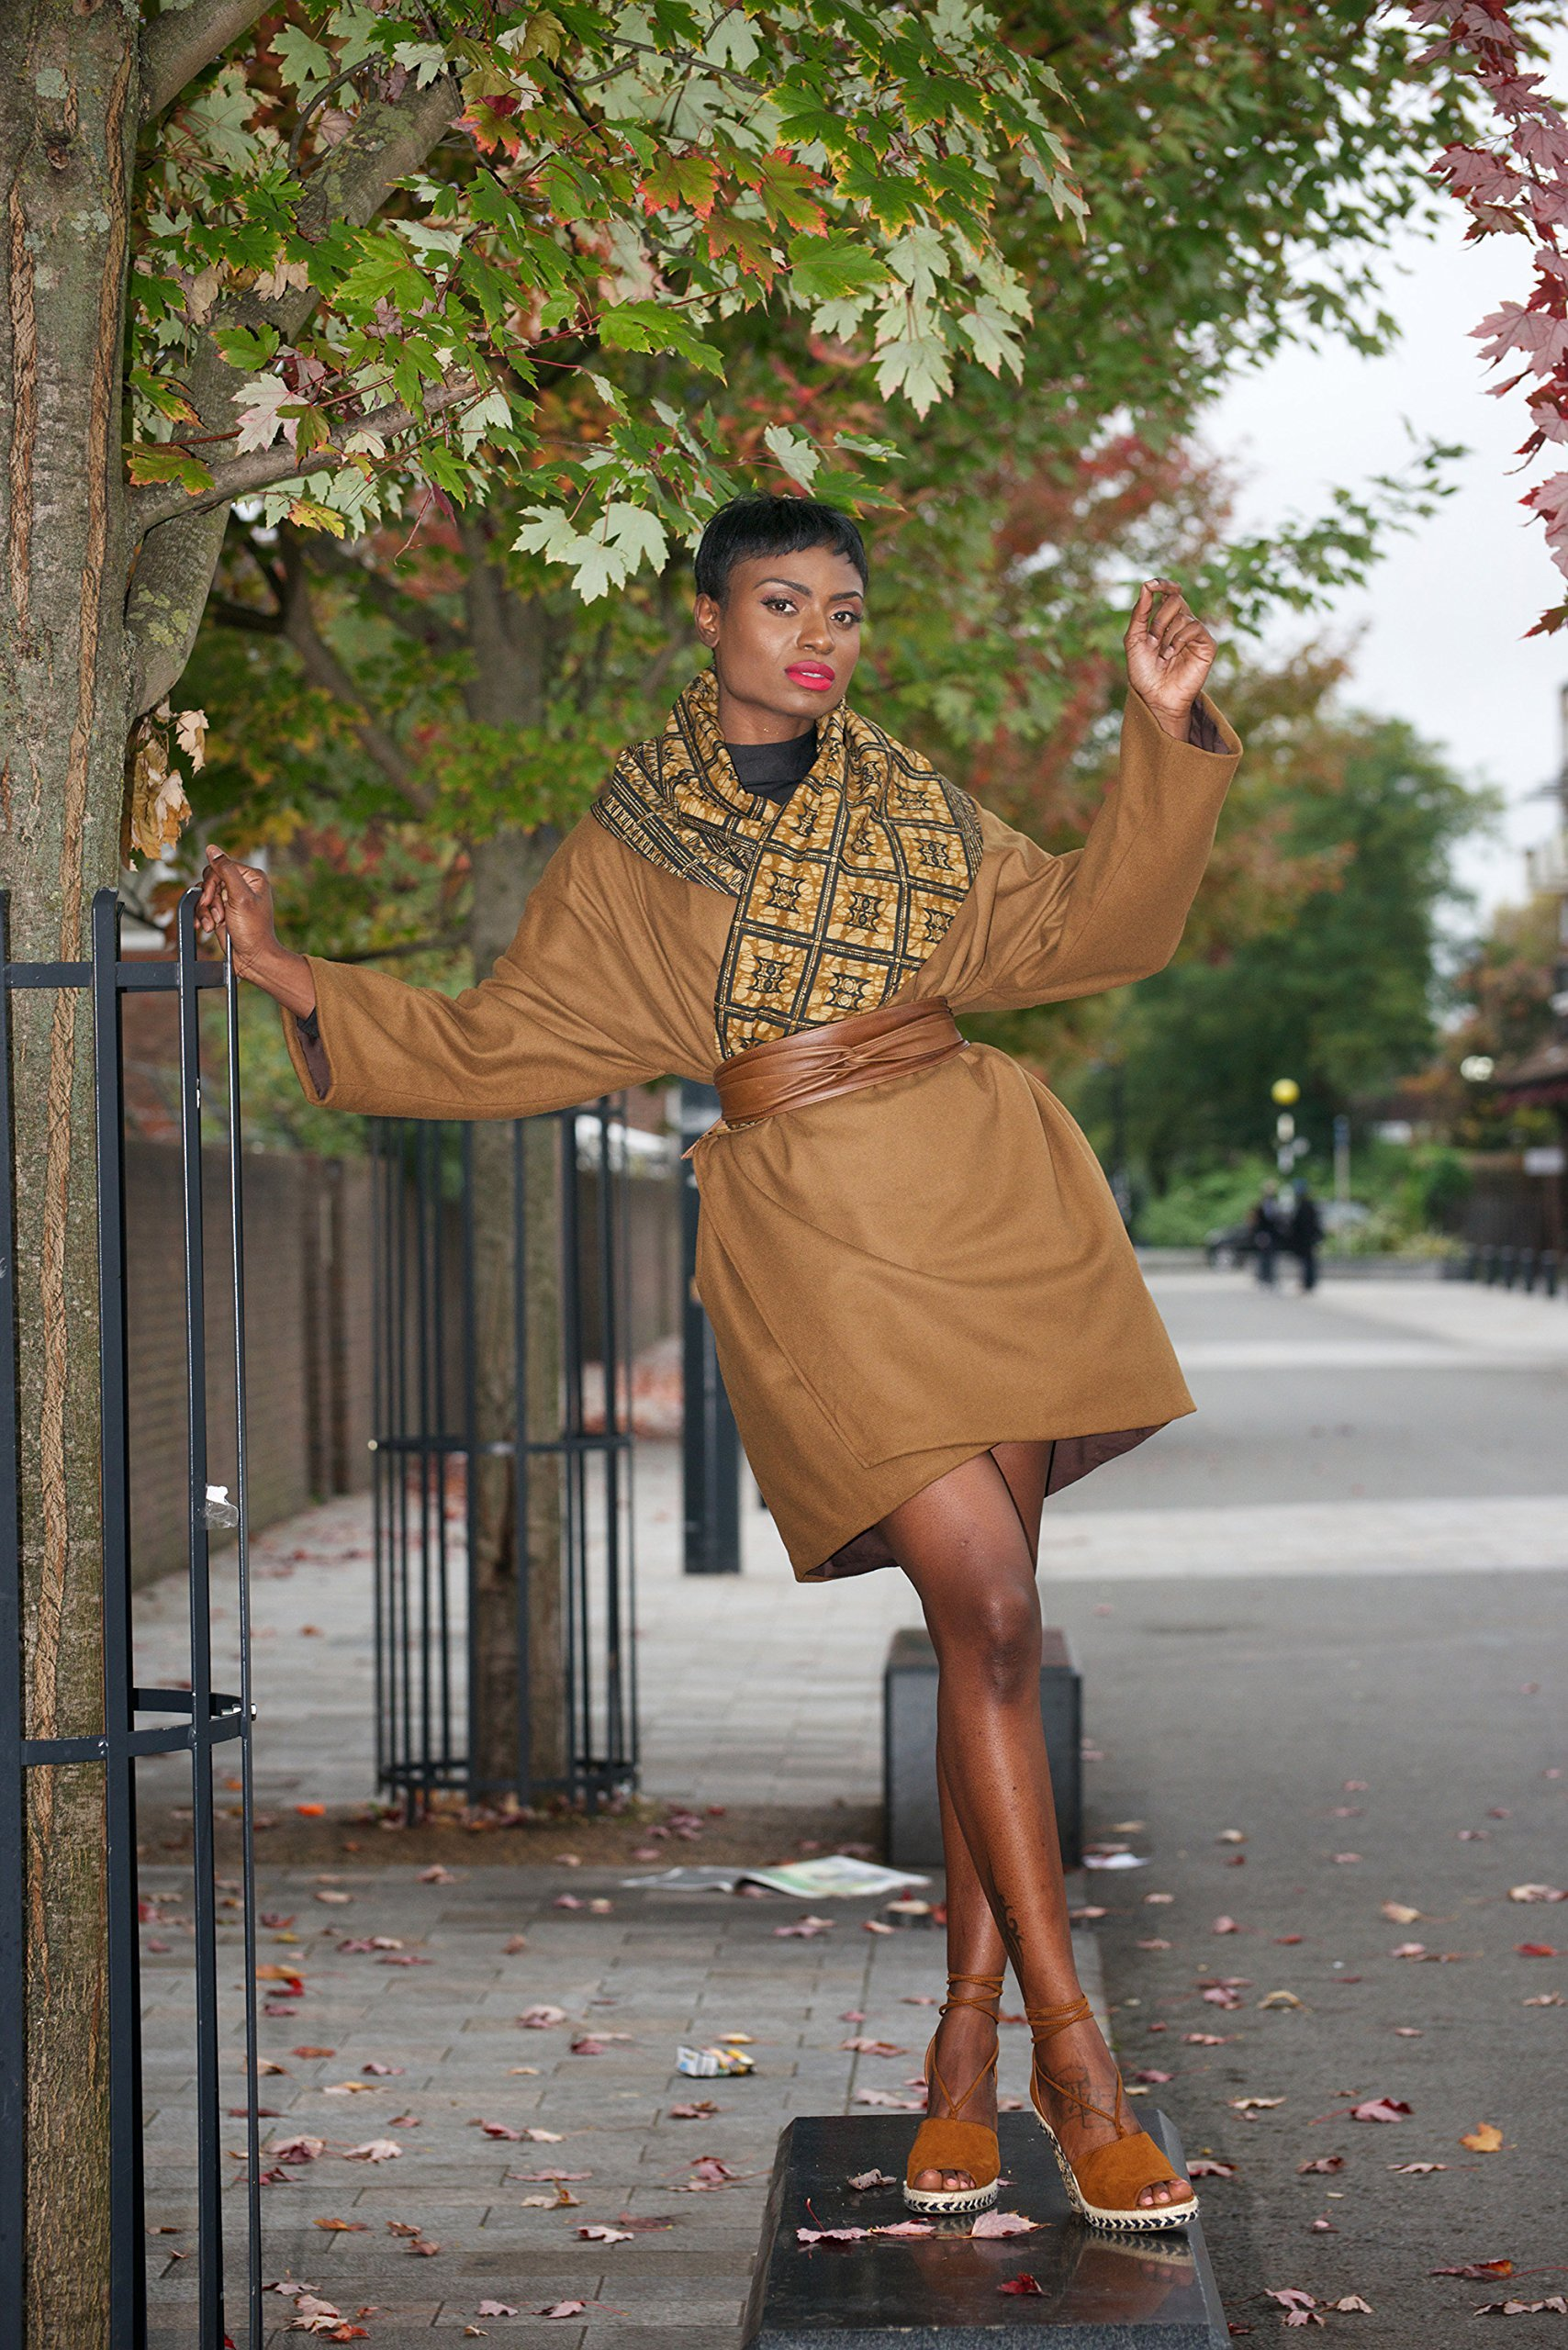 Winter coat and belt / winter jacket/ wool coat/ winter warmer/ ankara coat/ African print jacket/ trench coat - Camel